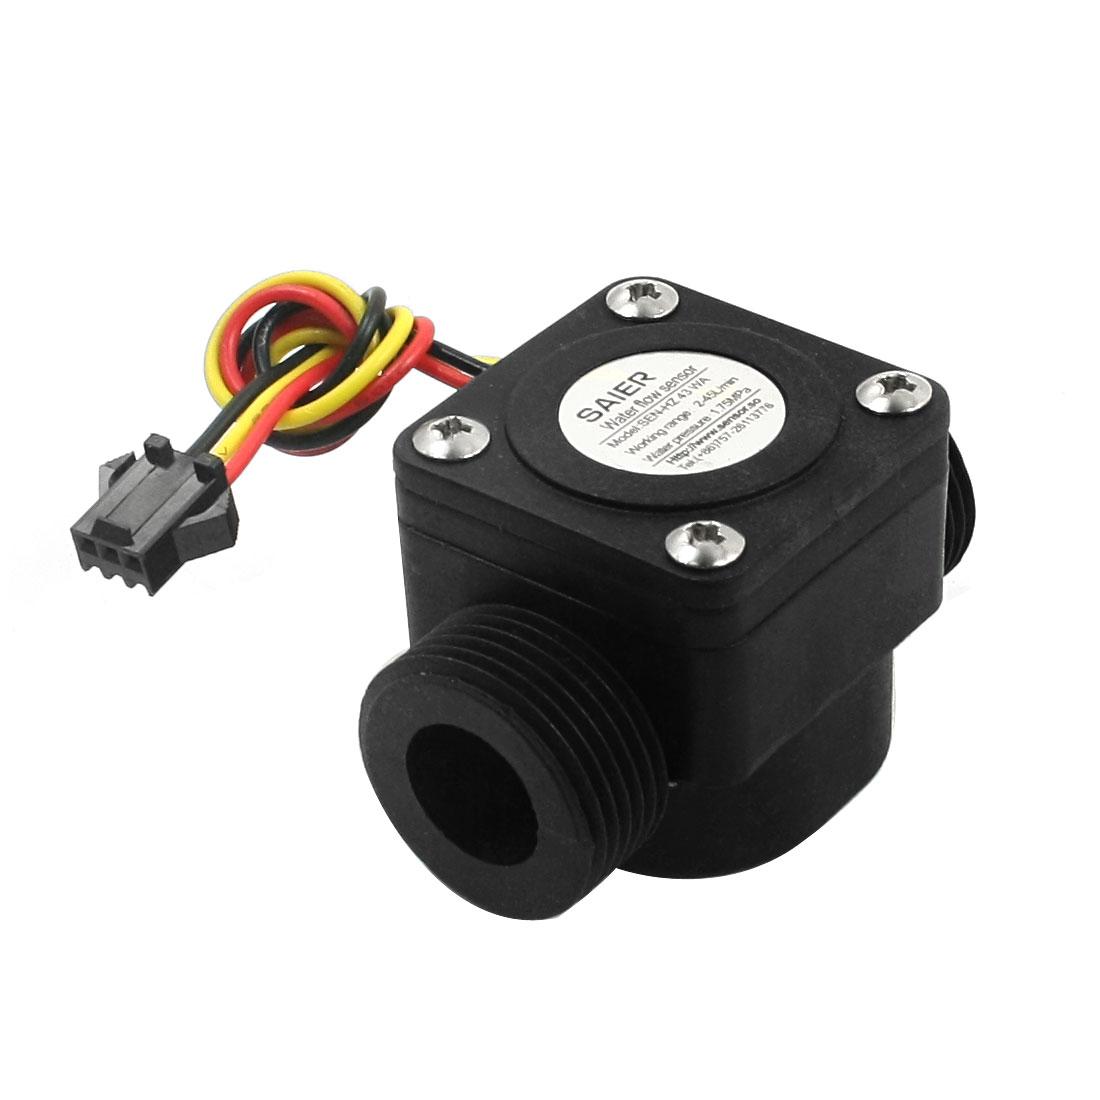 SEN-HZ43WA G3/4 Threaded Hall Flow Sensor Water Control Flowmeter 2-45L/min